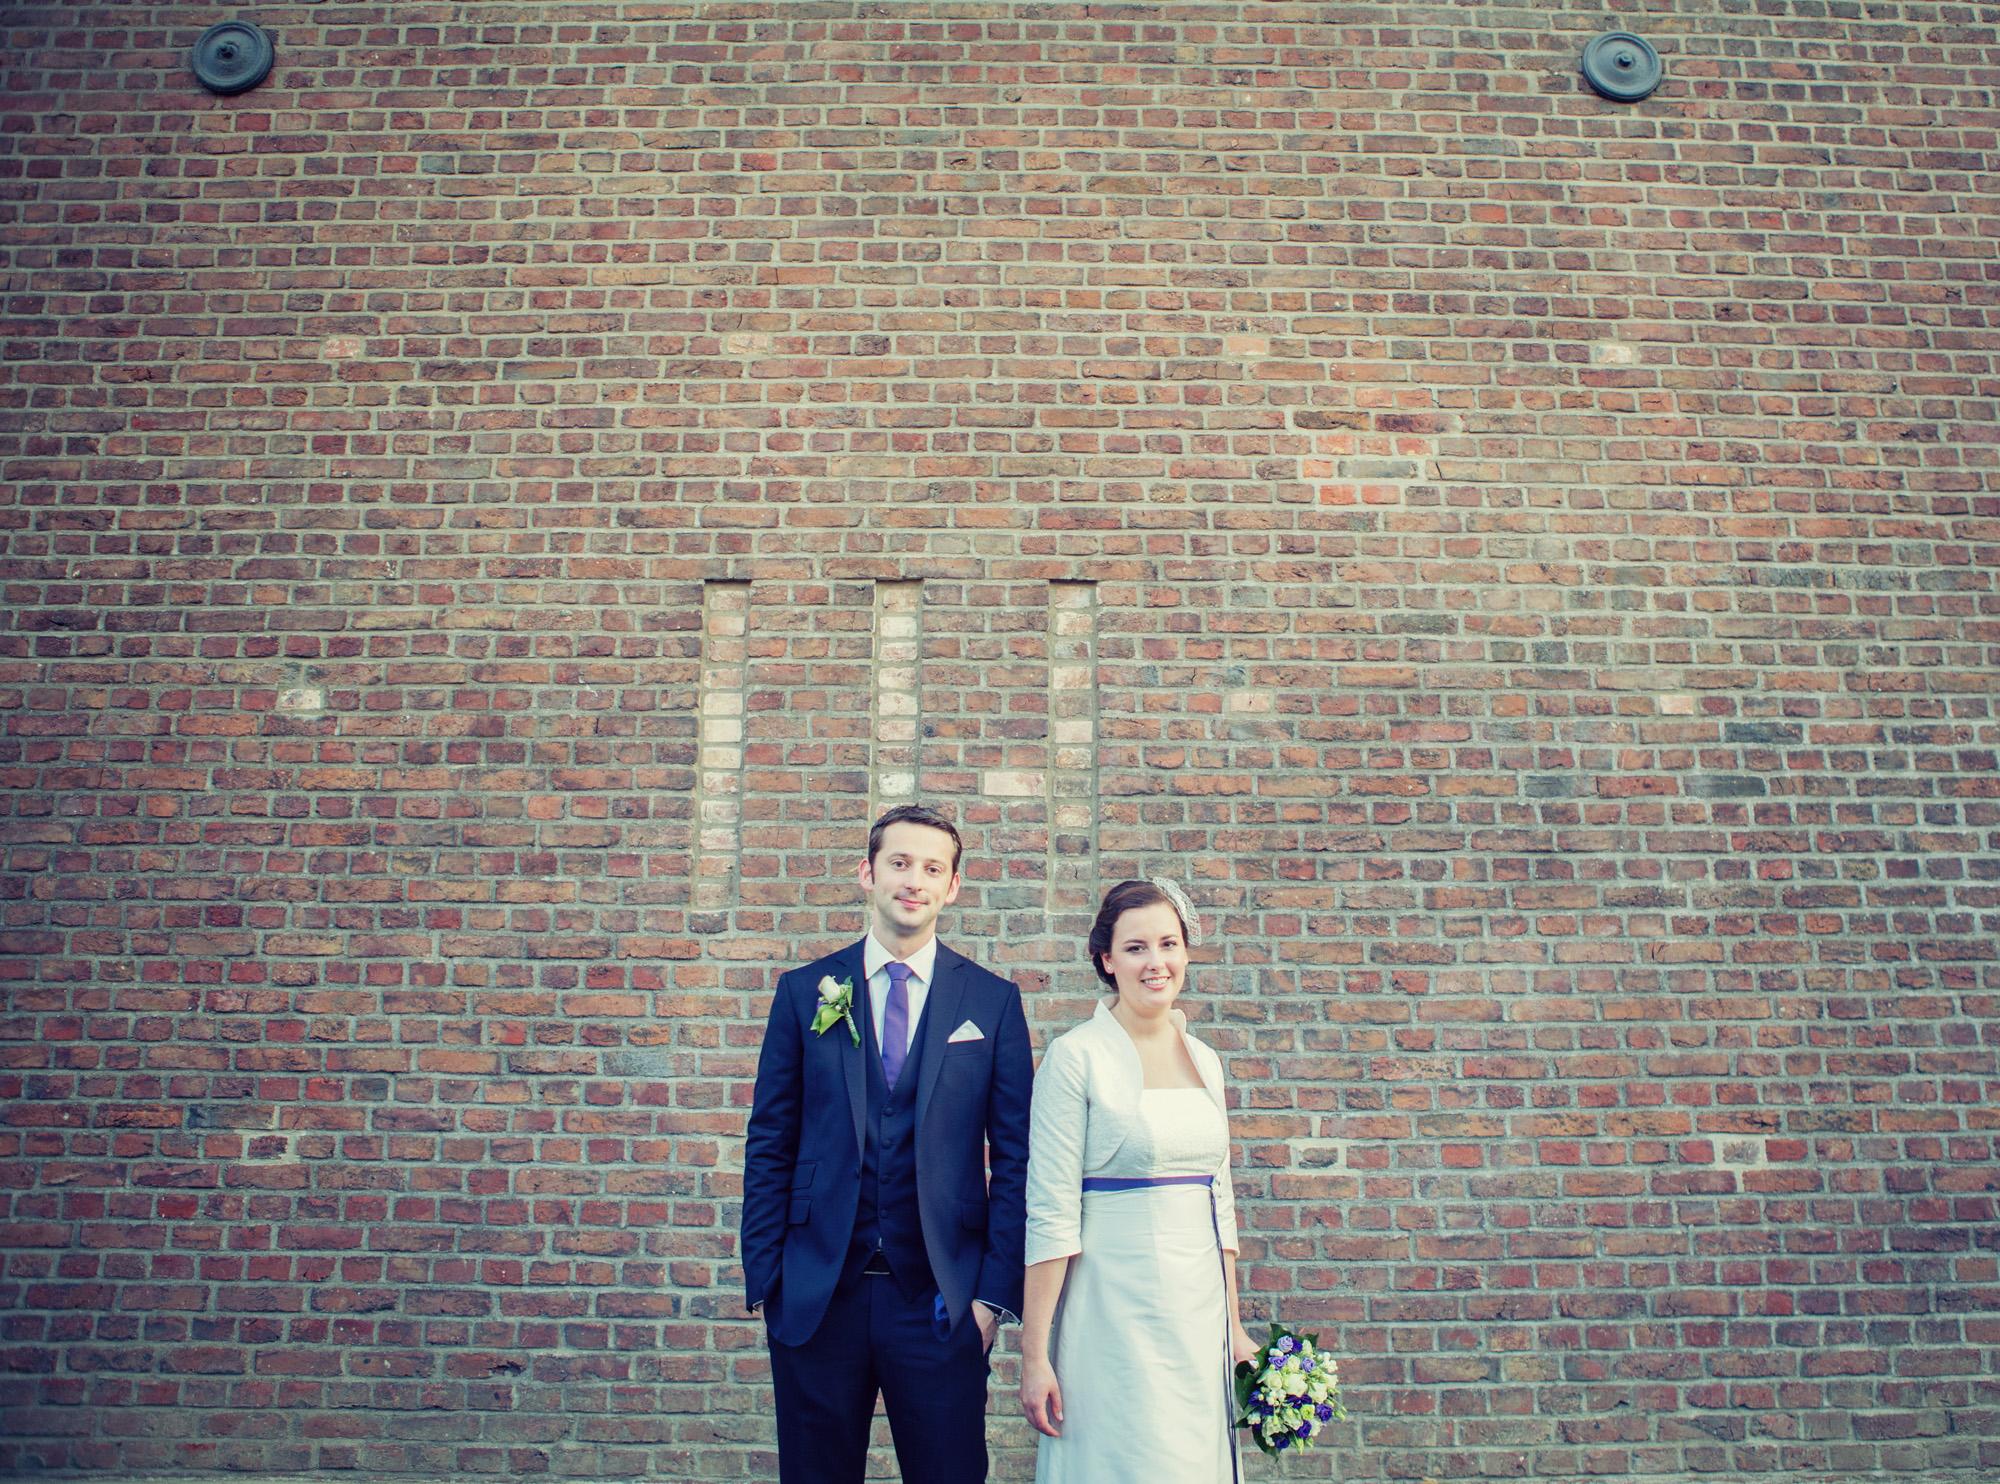 Hochzeit-Schloss-Bruehl_30.jpg